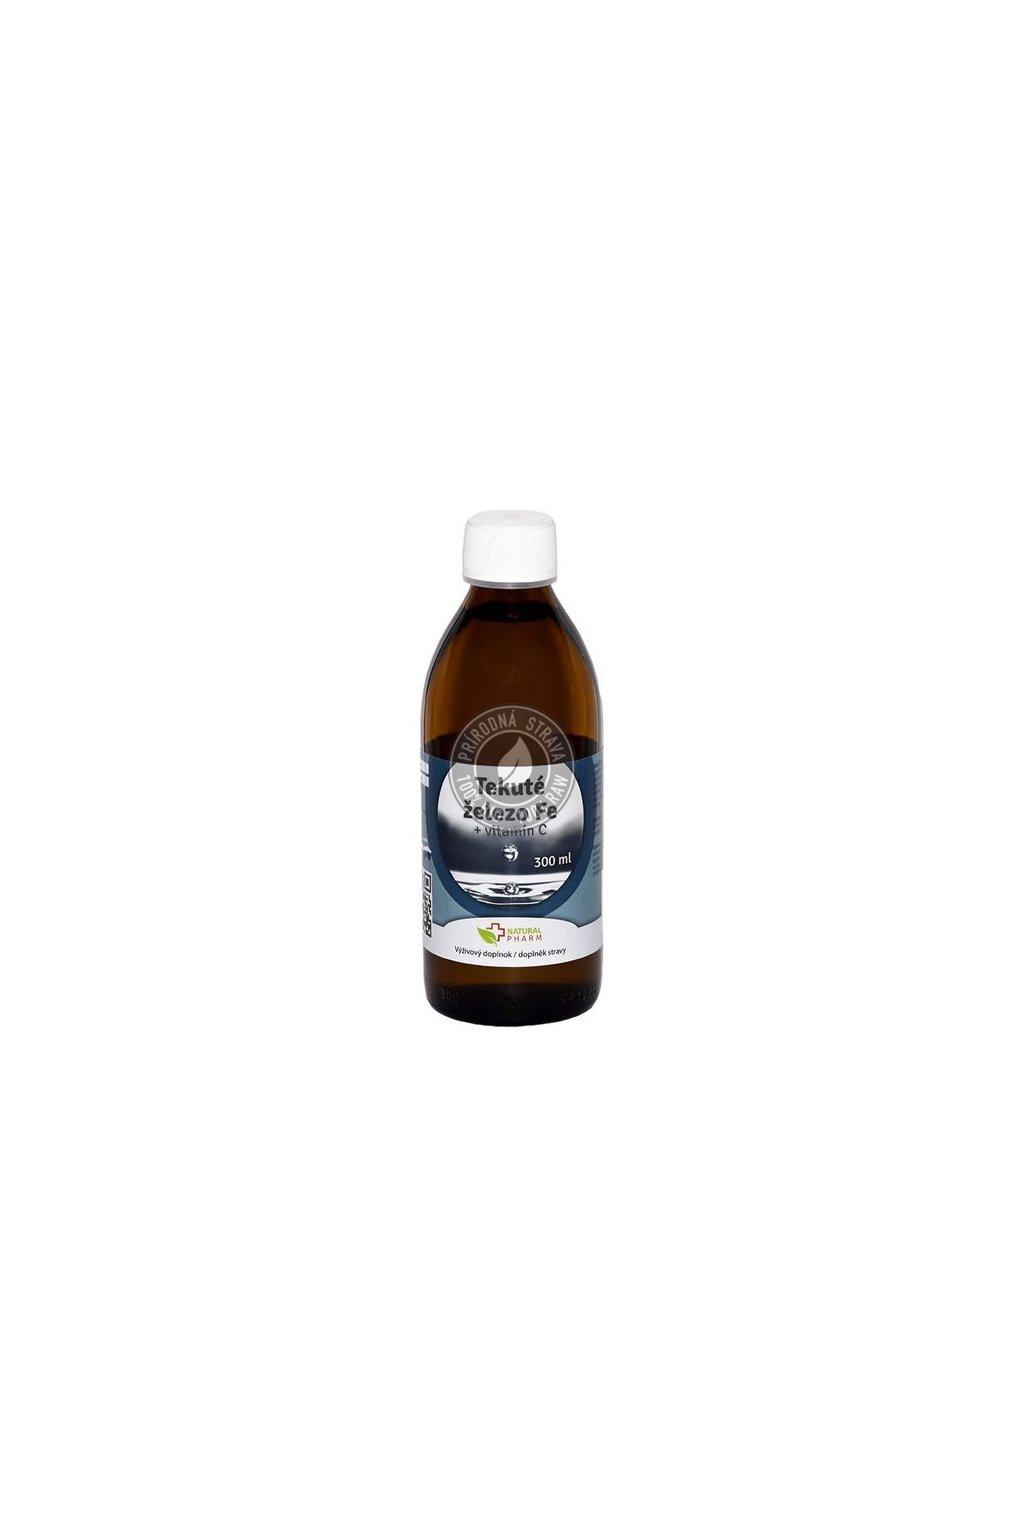 tekute zelezo fe vitamin c 300 ml 550